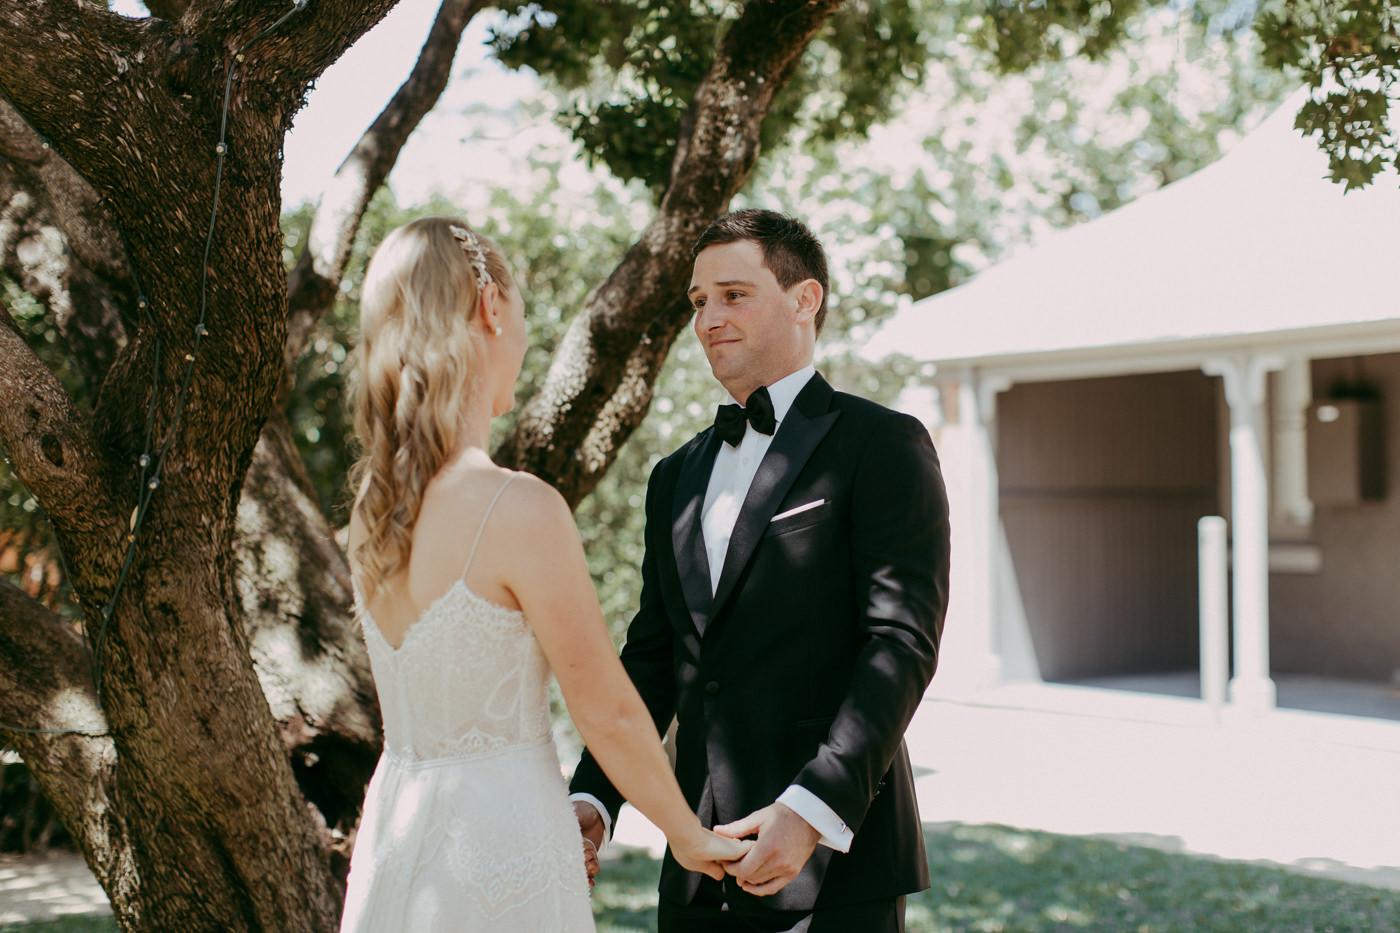 Anthony & Eliet - Wagga Wagga Wedding - Country NSW - Samantha Heather Photography-38.jpg